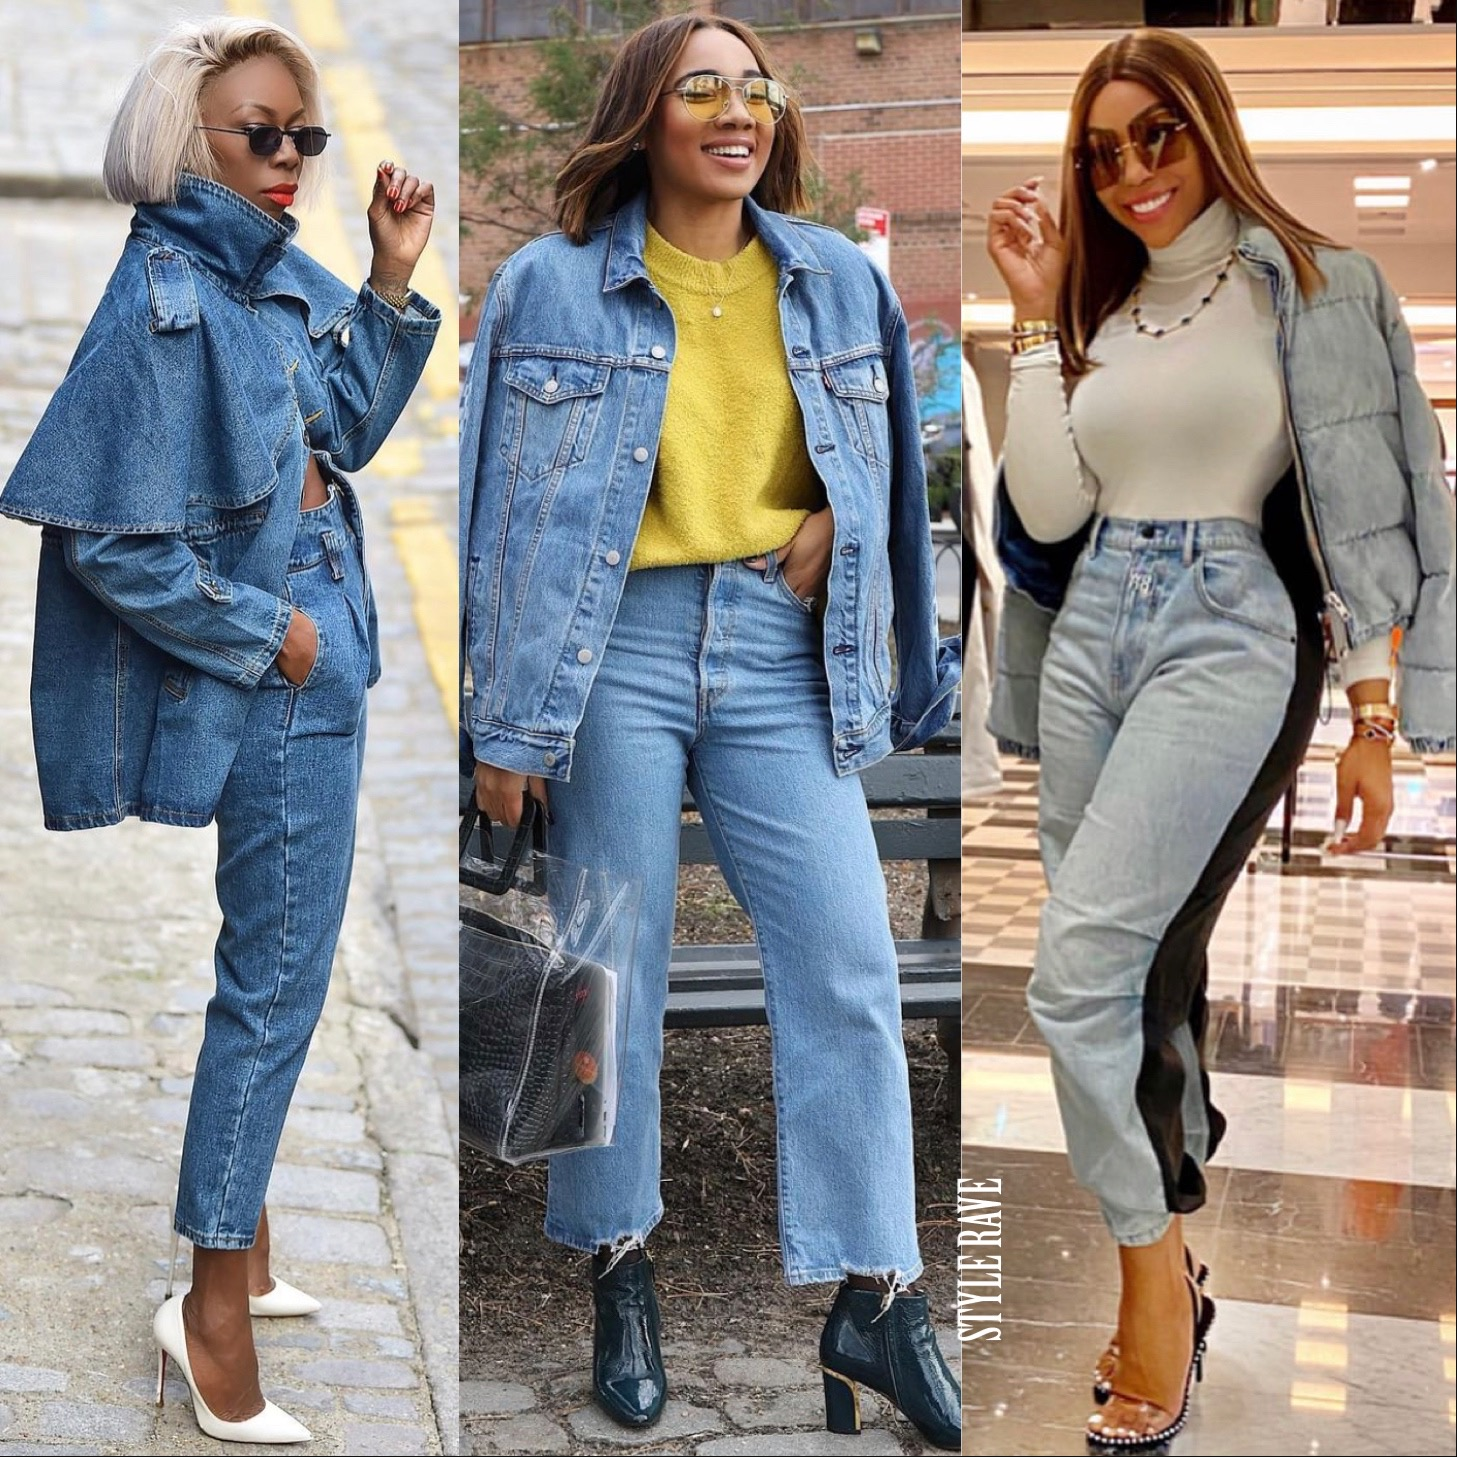 3 black women show how to wear denim on denim on denim day 2021